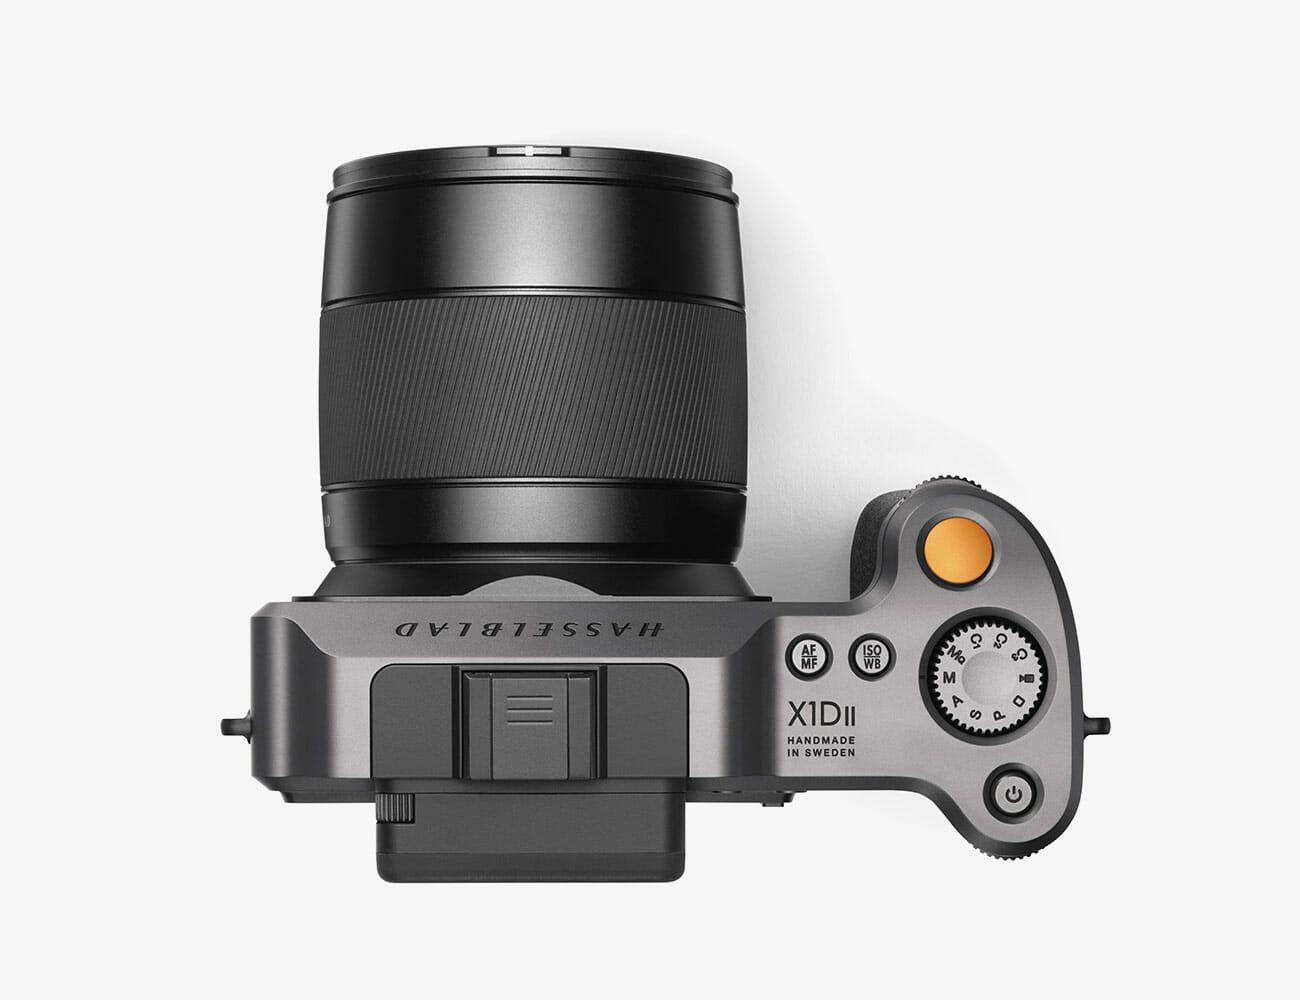 Hasselblad-X1DII-Gear-Patrol-Ambiance-7